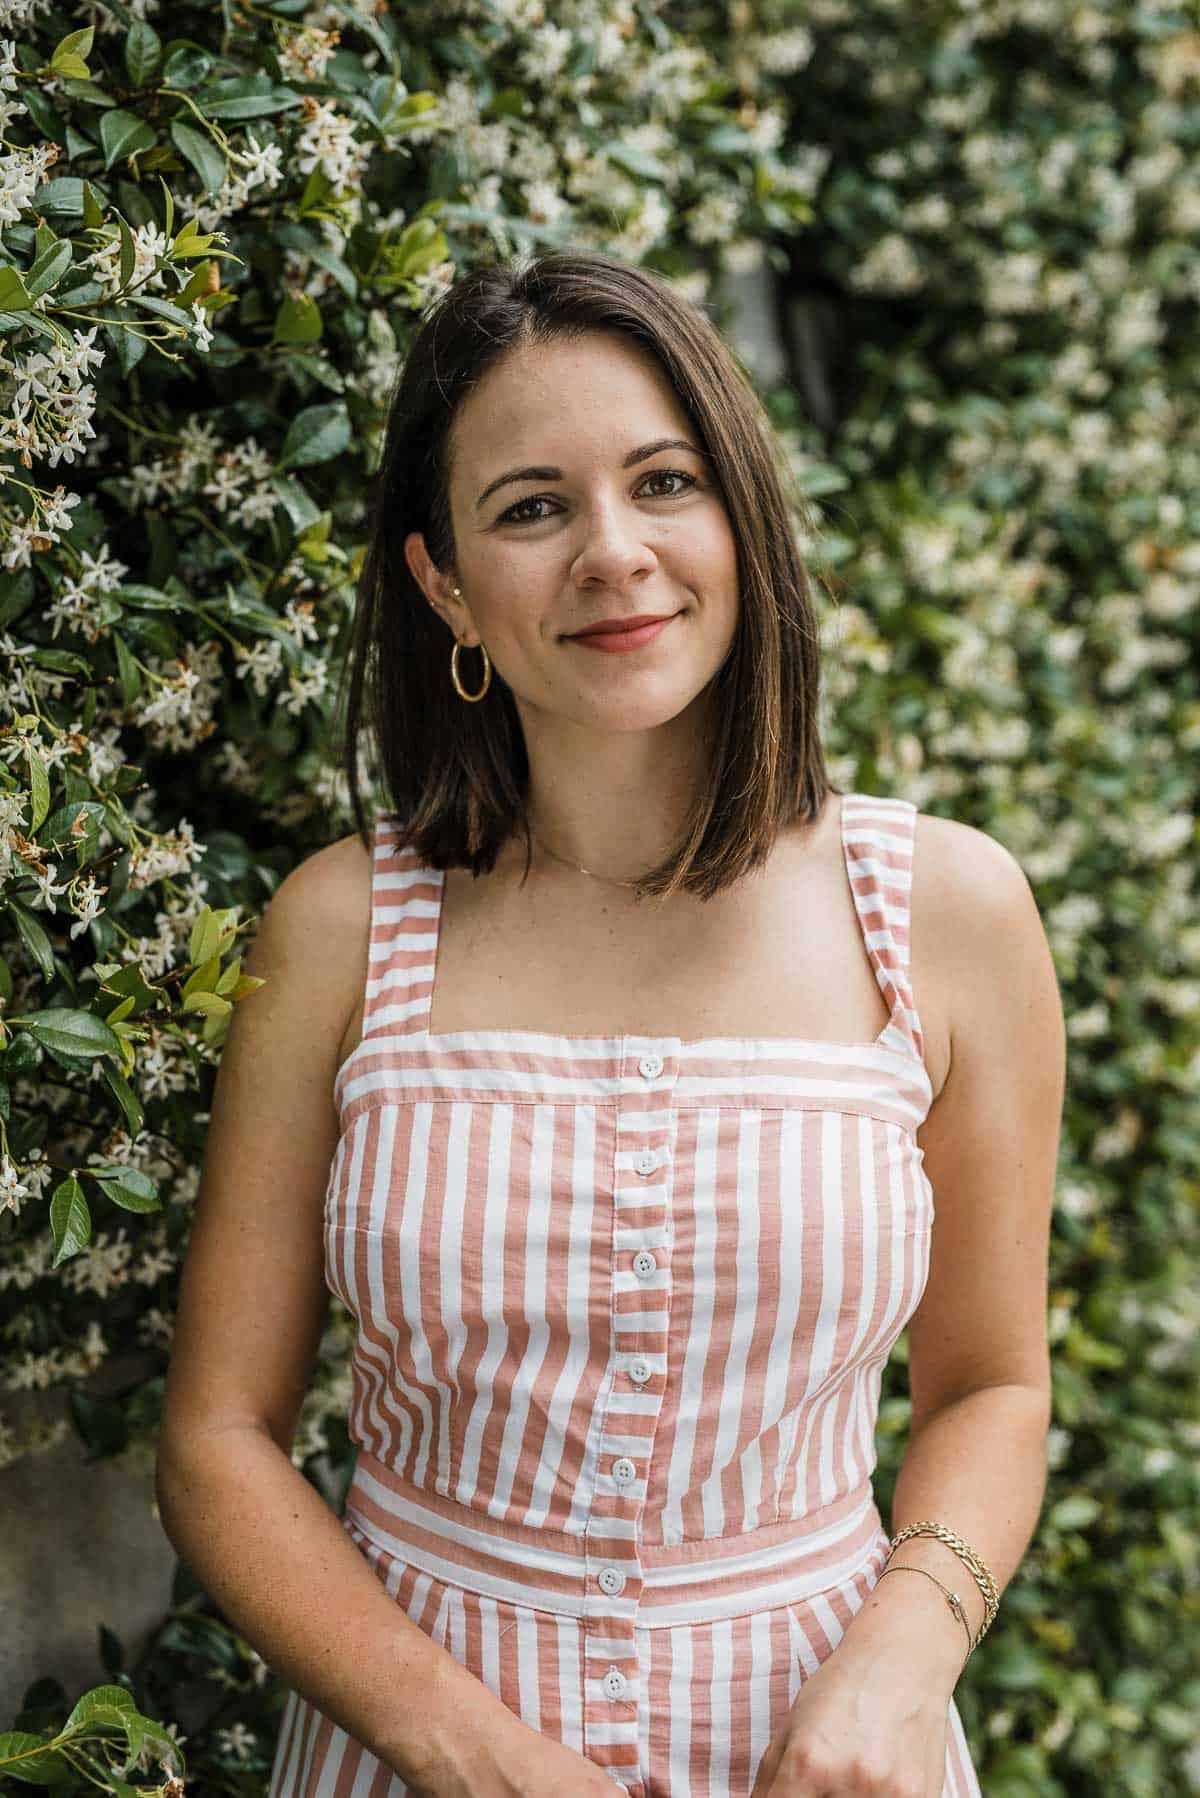 Jessica Camerata is wearing a striped maxi dress